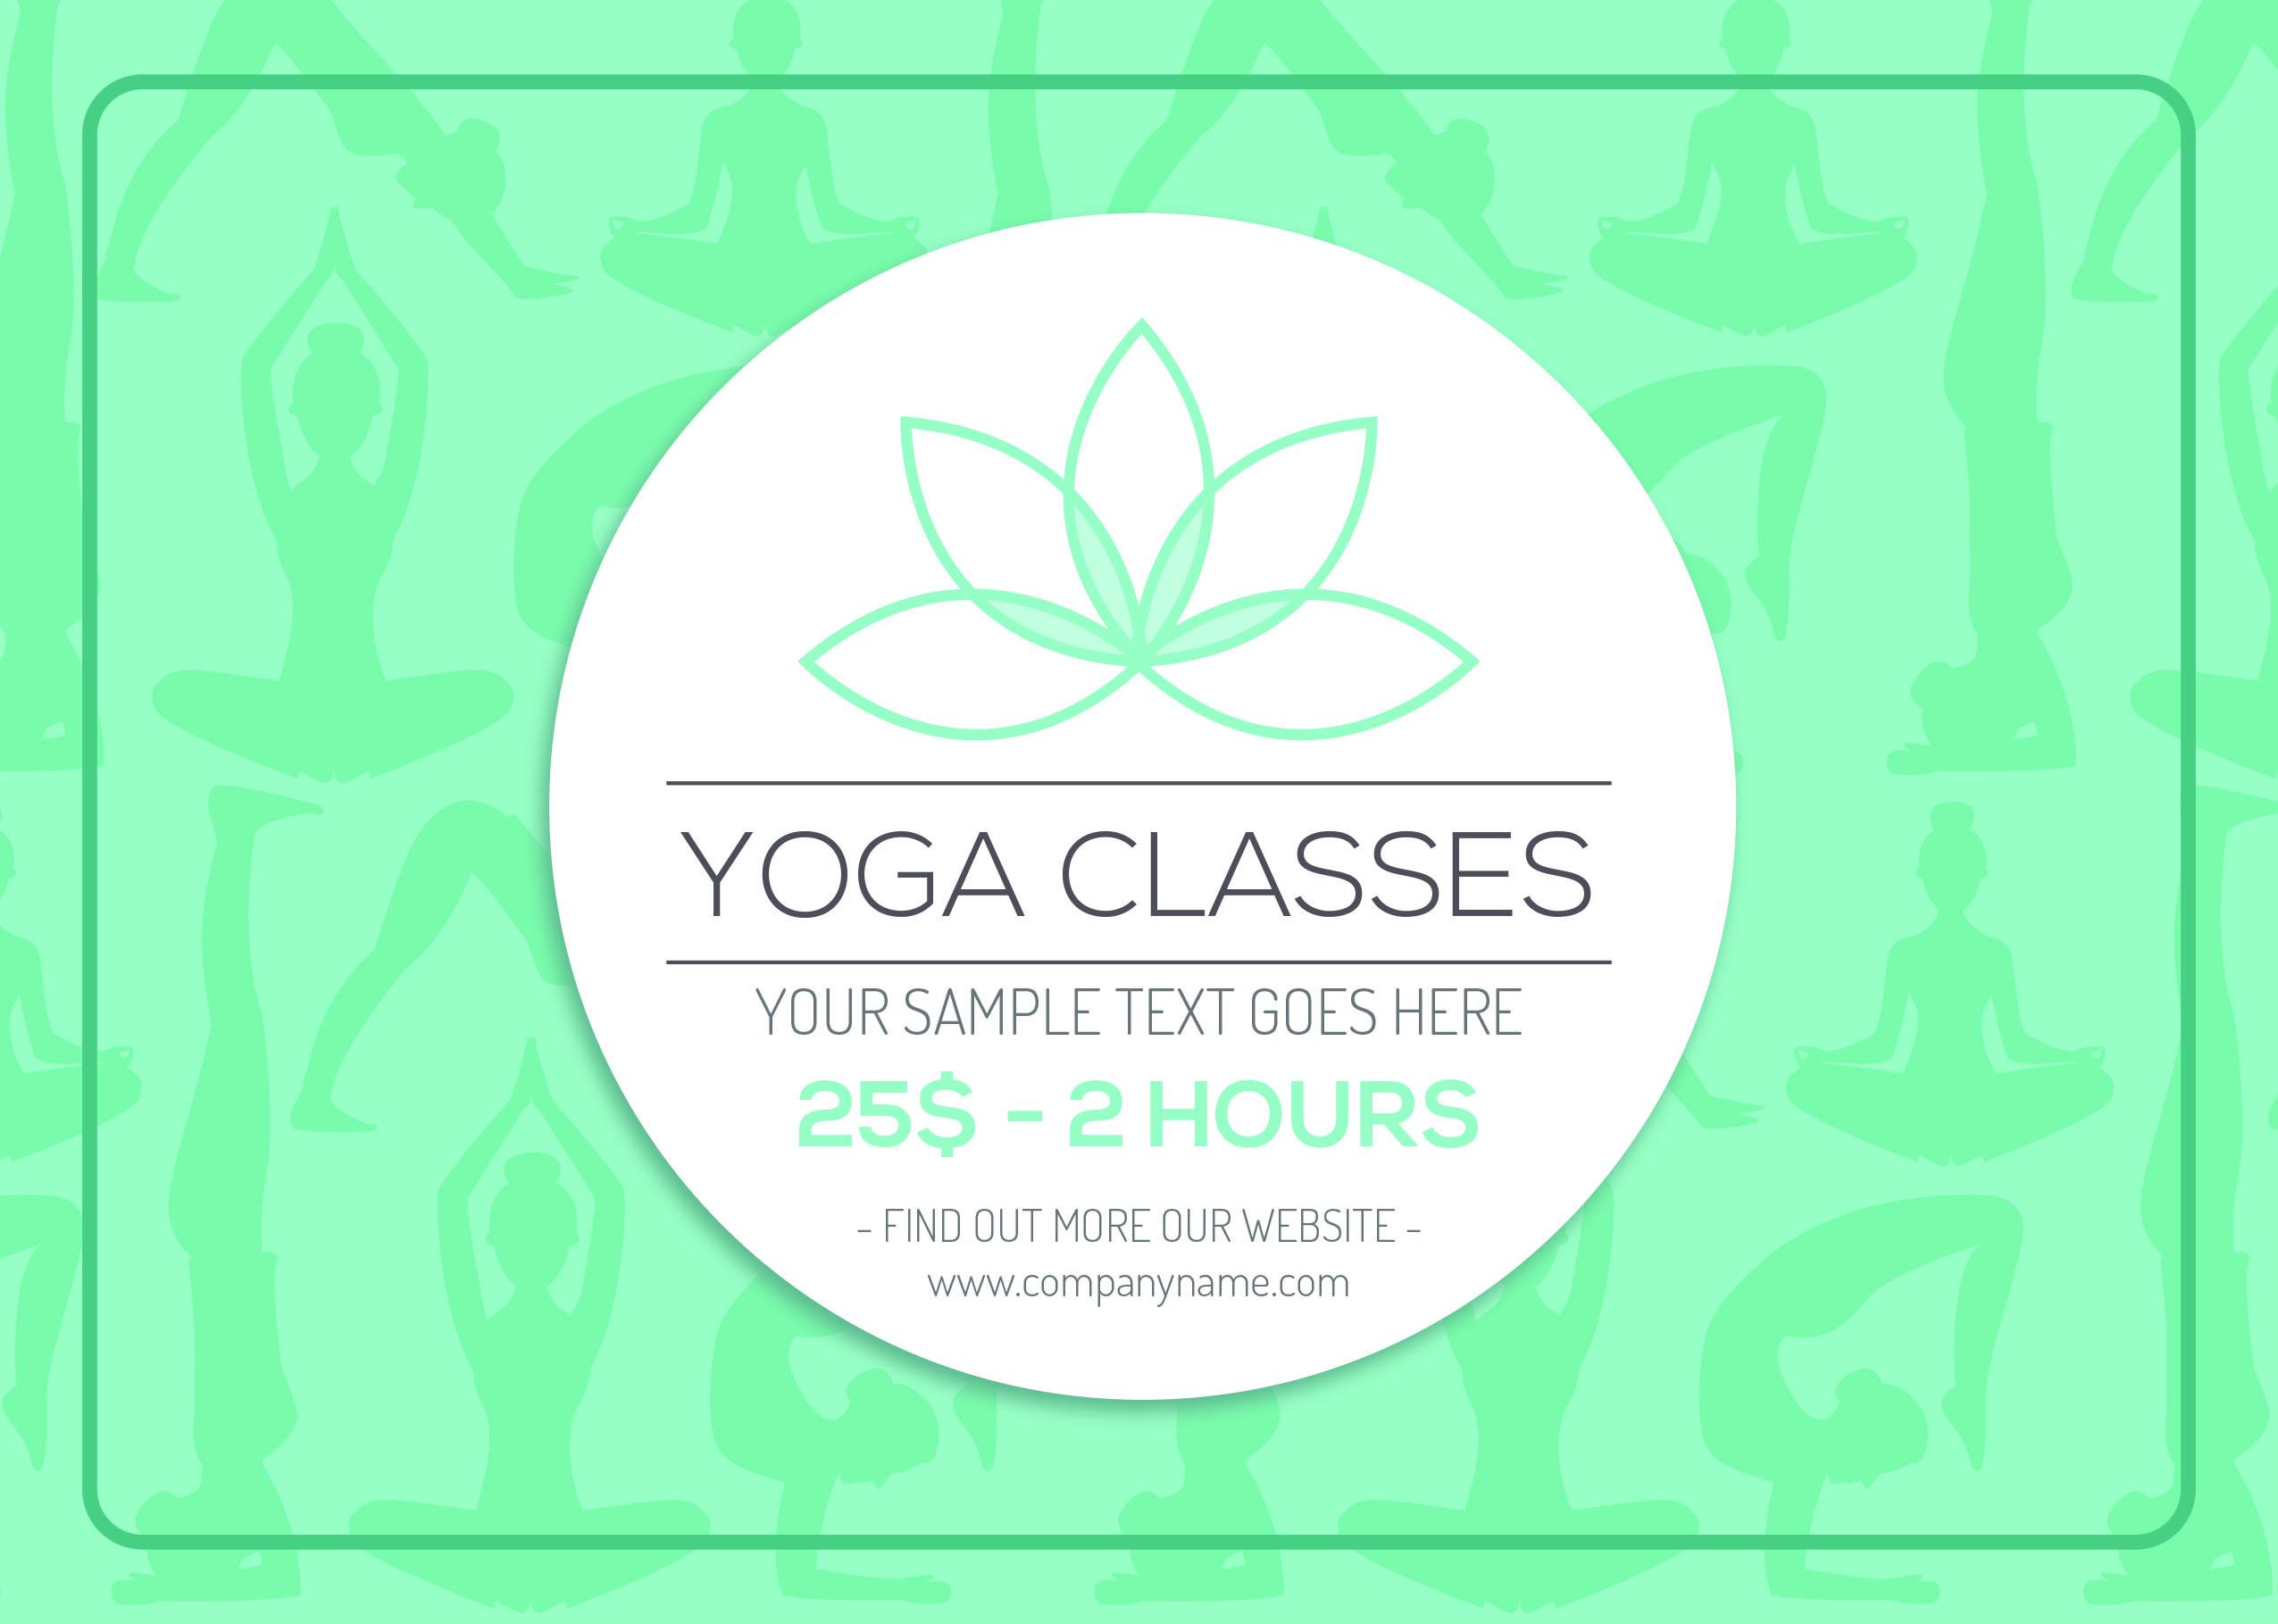 Yoga Brochure Templates Free Costumepartyrun